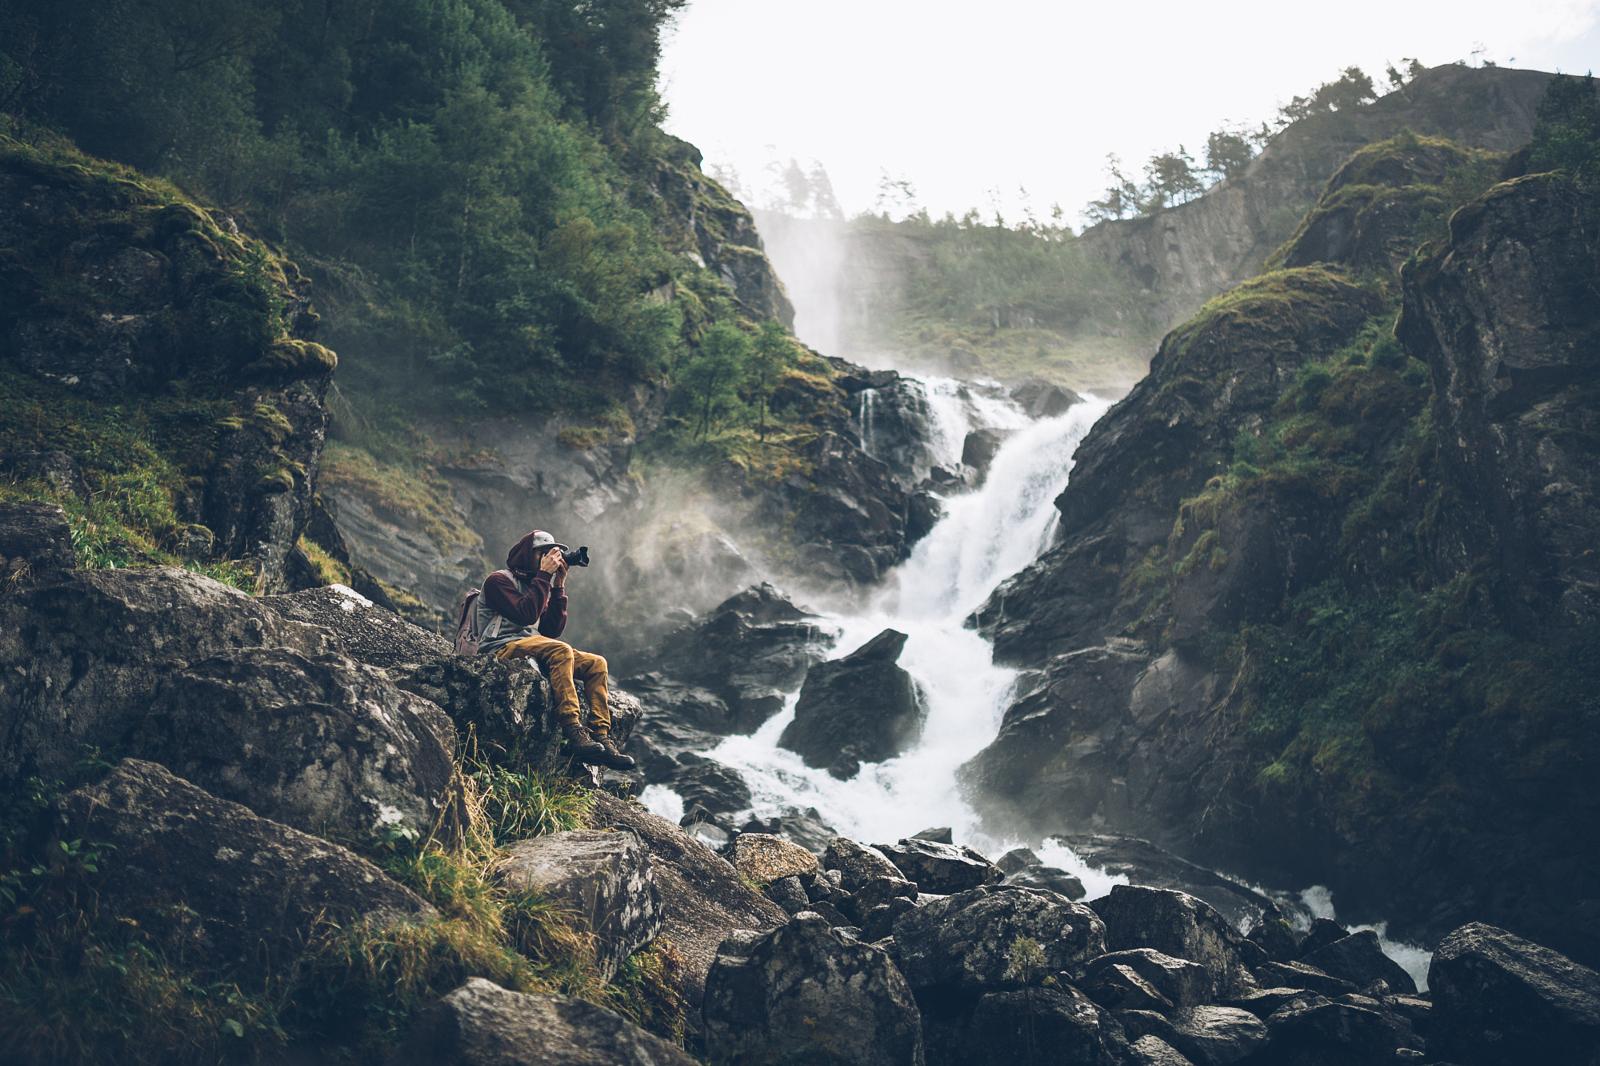 15 Awesomely Meta Photos of People Taking Photos